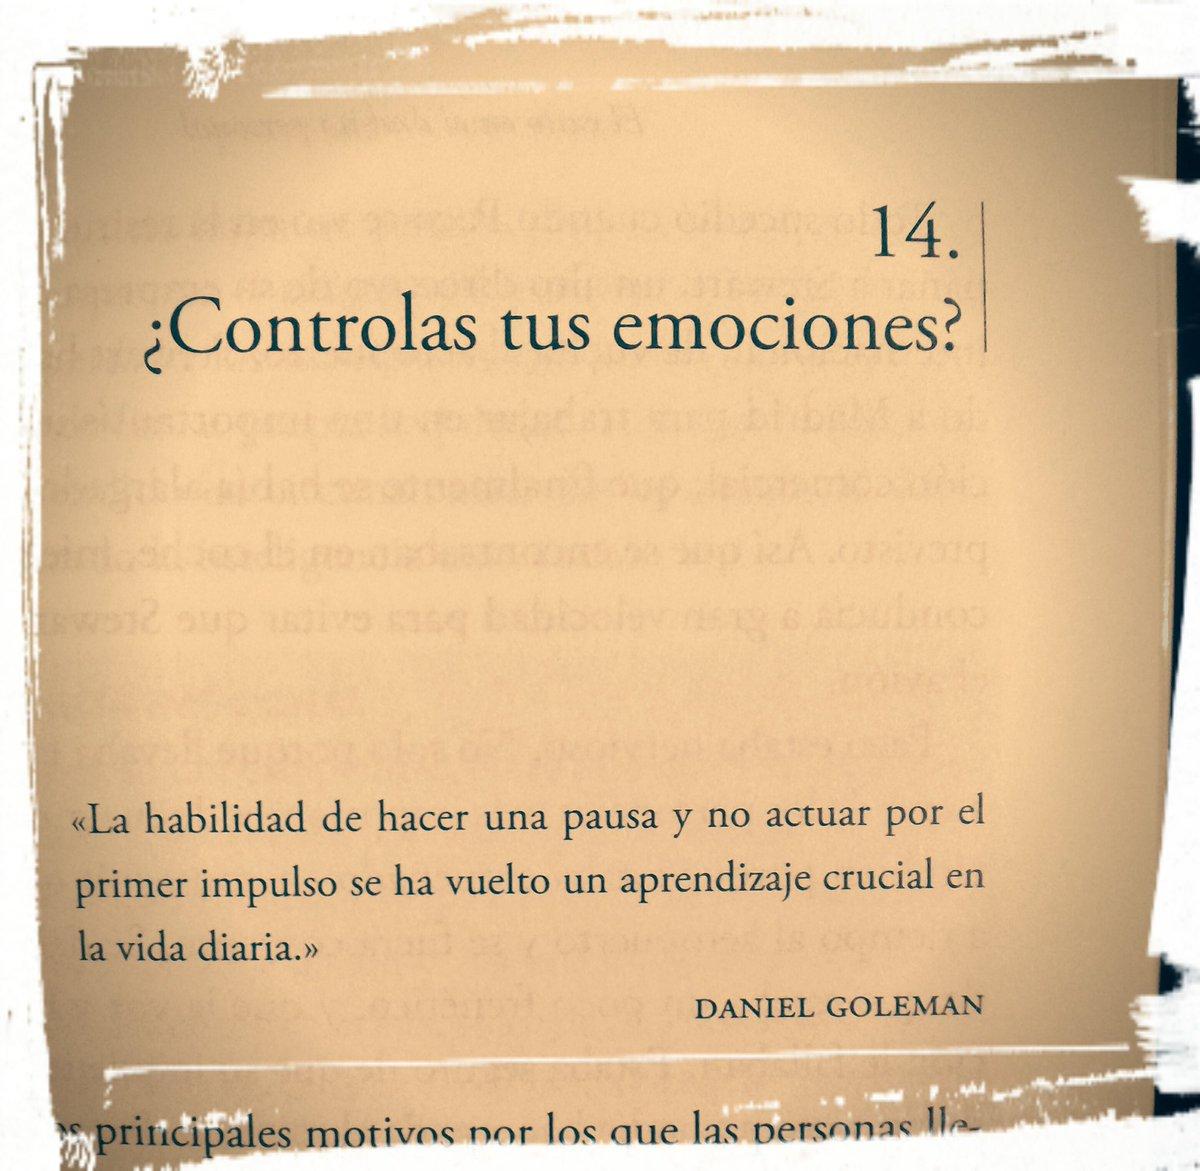 Inteligencia emocional, clave para todo en la vida... good night! @FrancescAssens  #GenteCorrienteConExito https://t.co/Oxk9dtw9xo